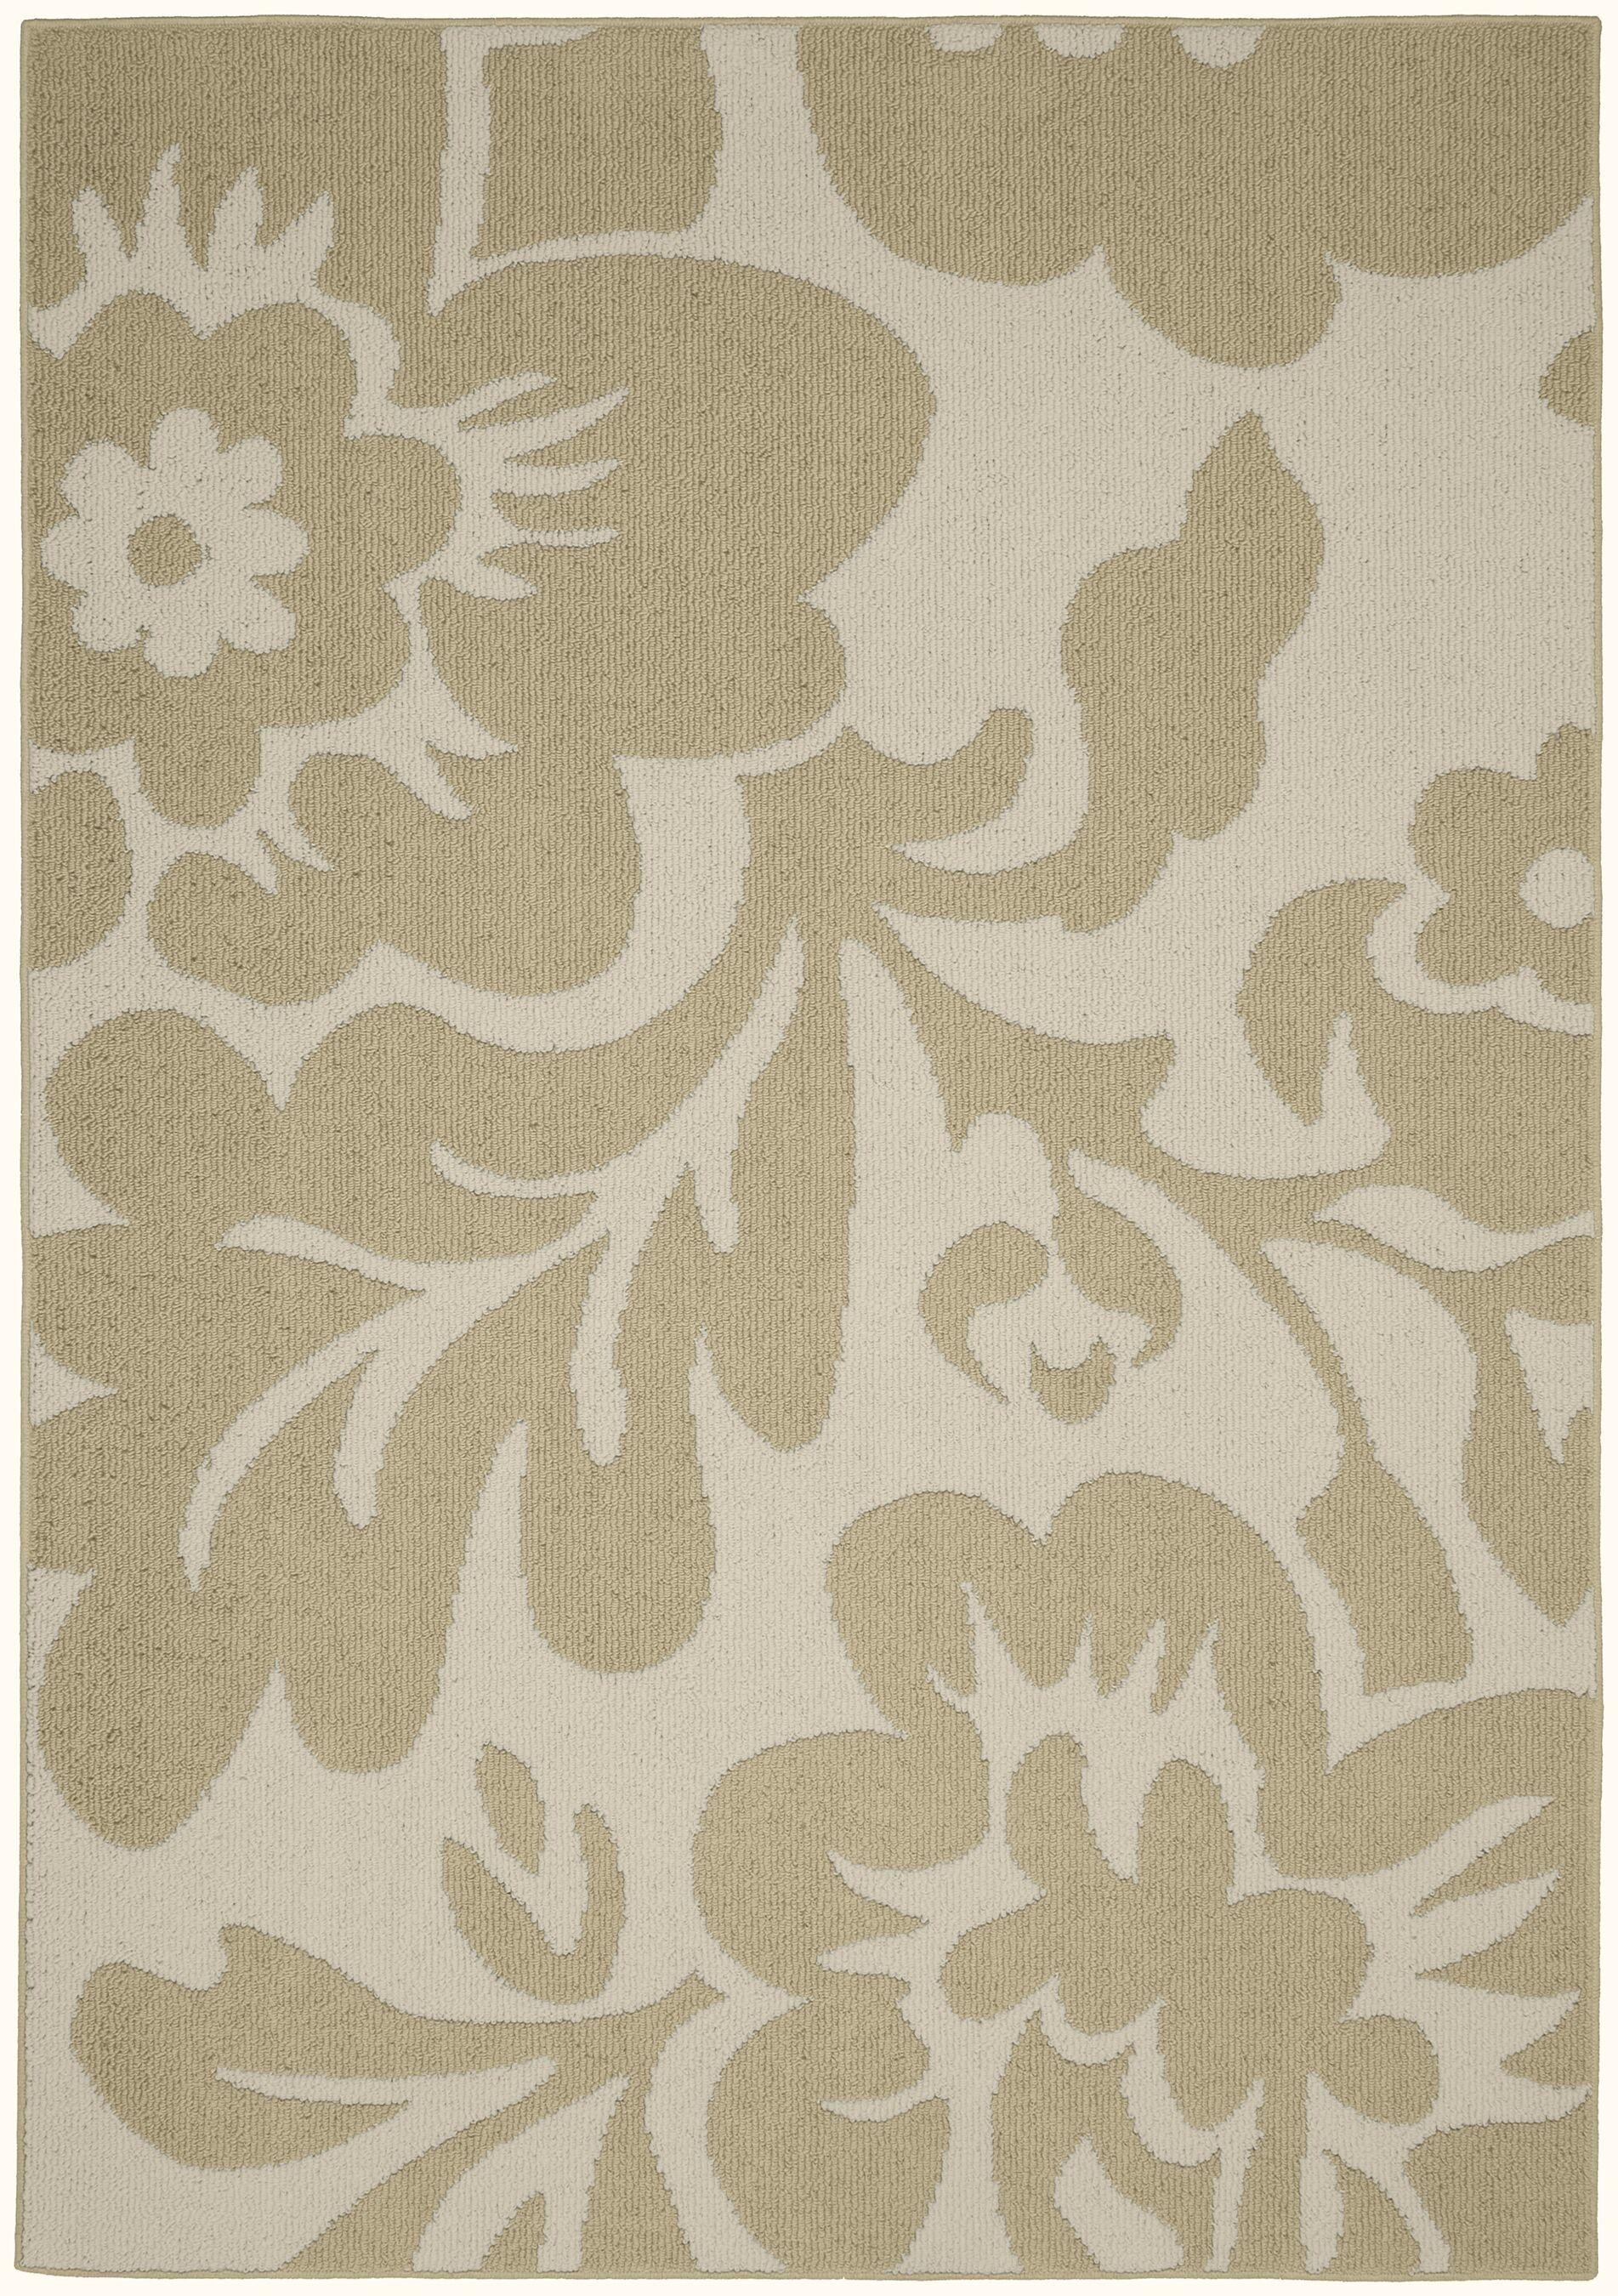 Floral Garden Tan/Ivory Area Rug Rug Size: 8' x 10'